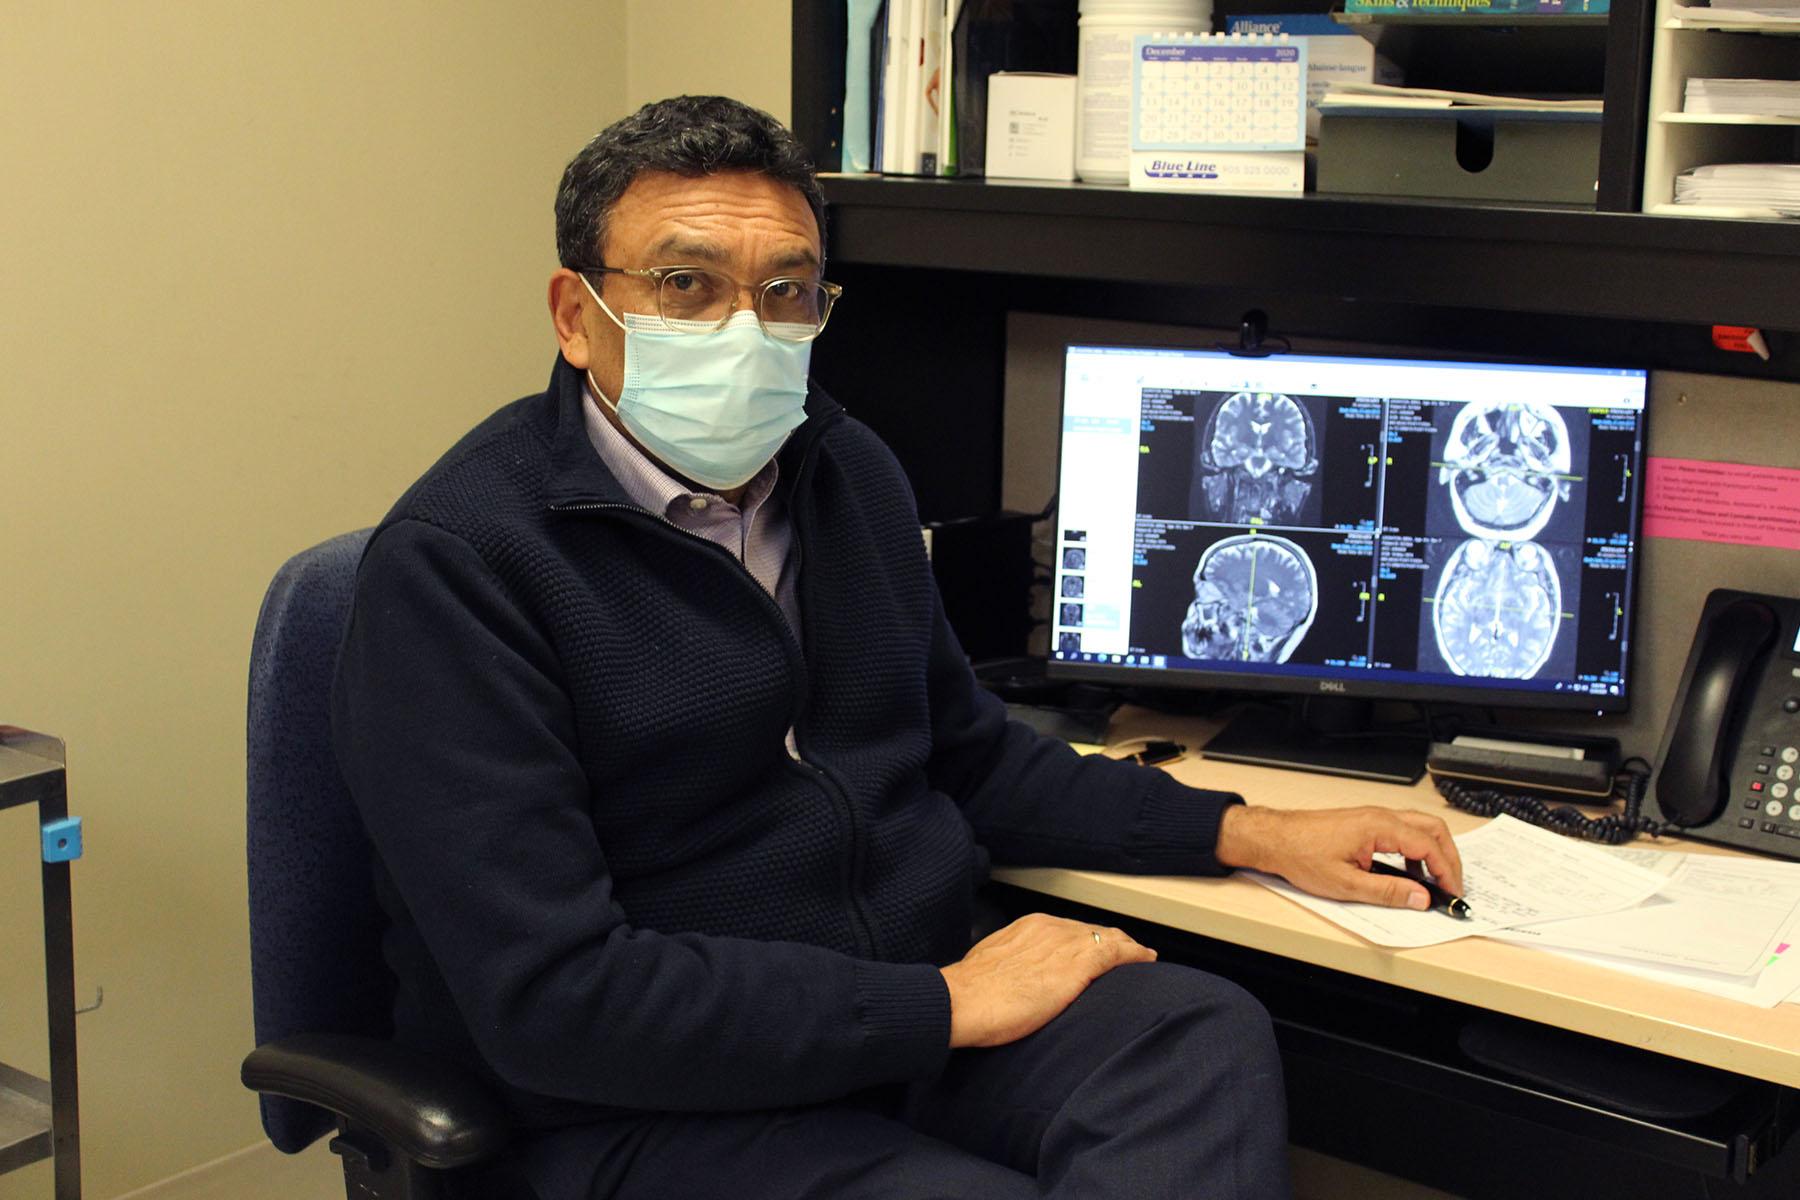 Luis Morillo, Neurologist